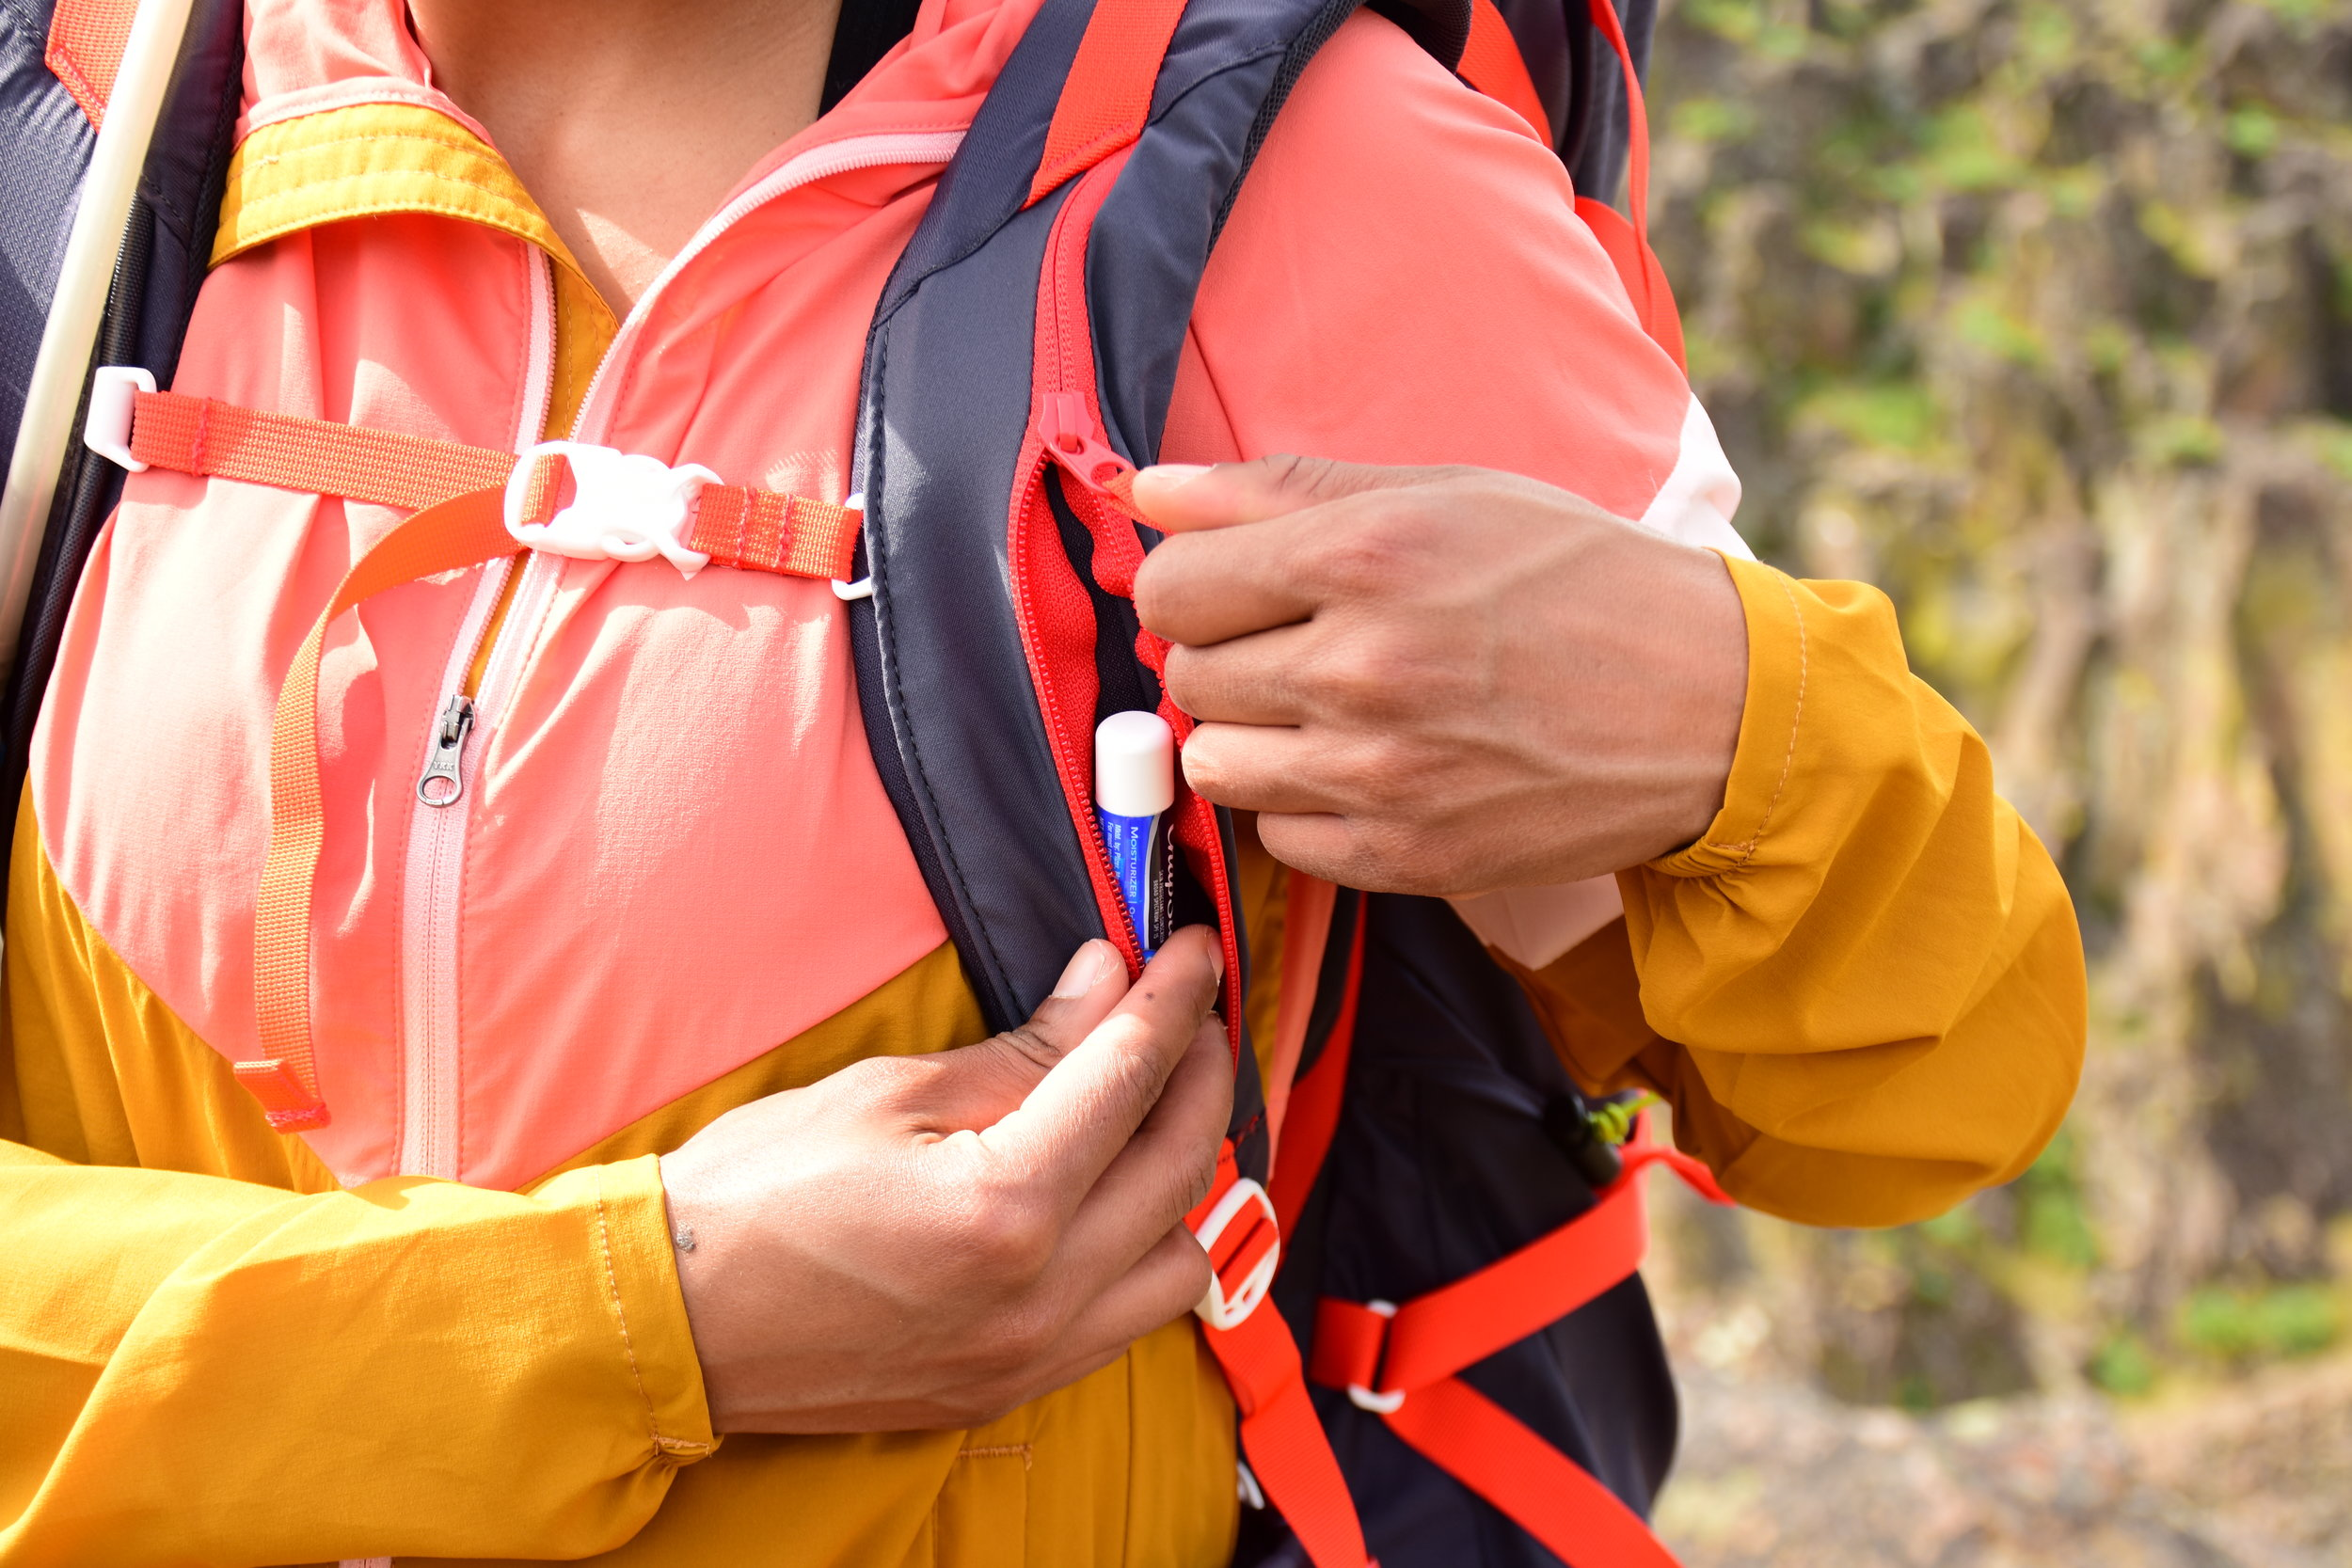 Vertical strap pocket to store small items like lip balm or car keys.  Photo courtesy Nathan Kaul